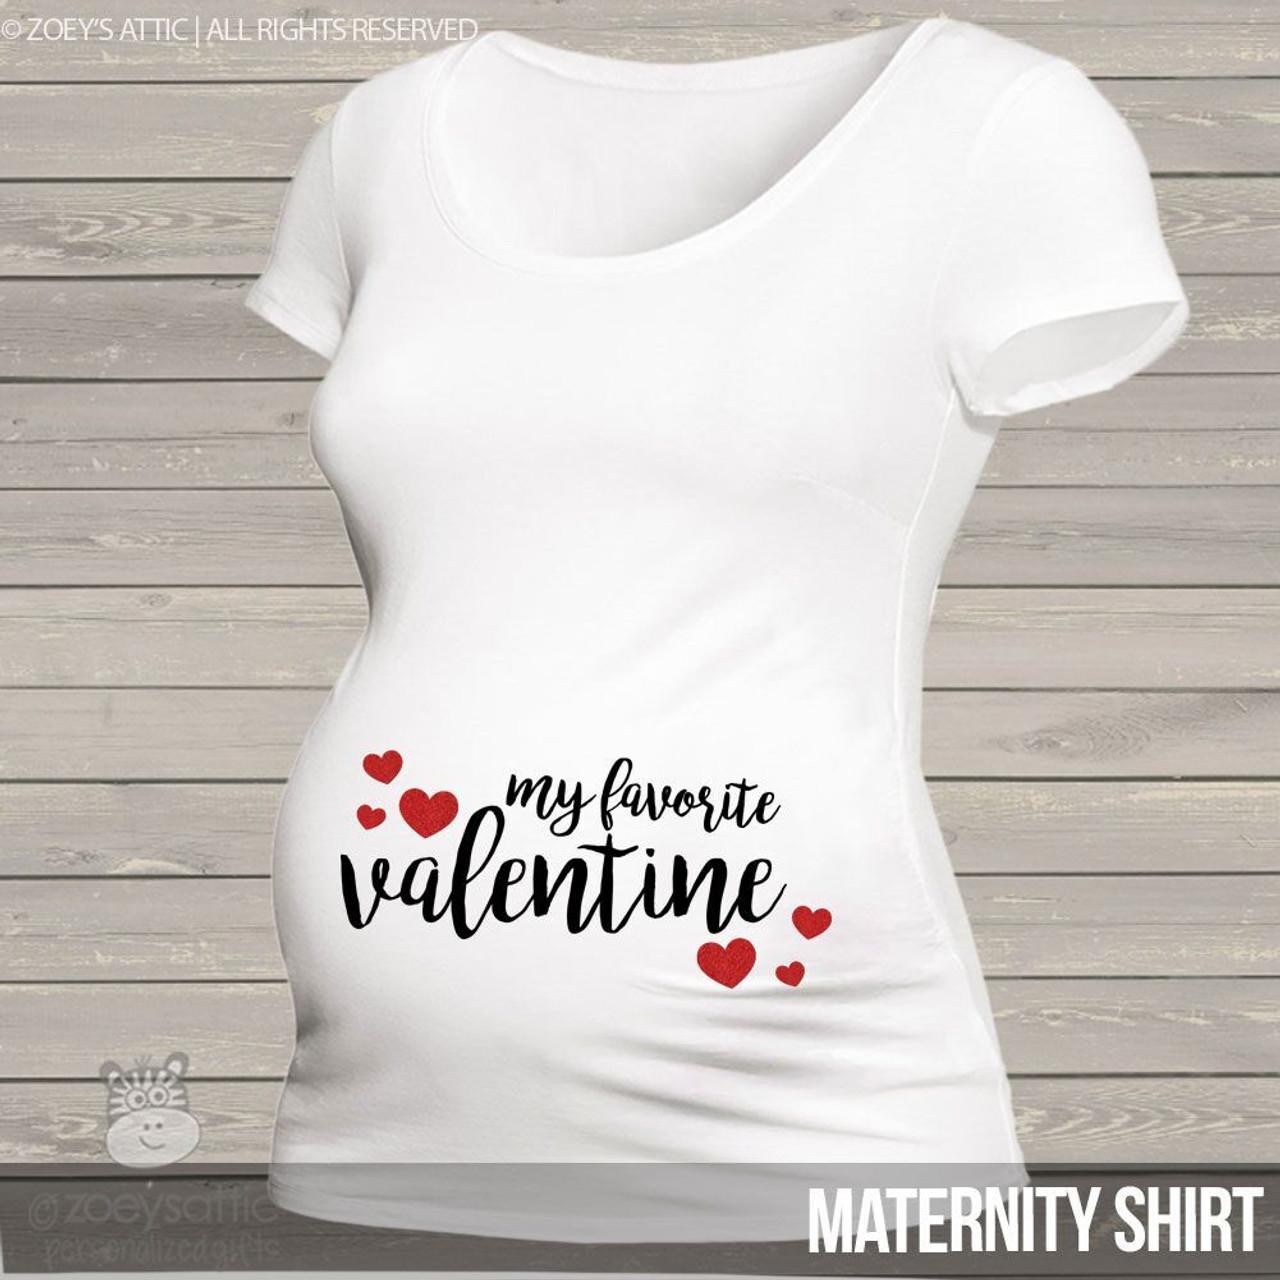 01e3d51b3a292 Valentine maternity shirt, glitter hearts custom top